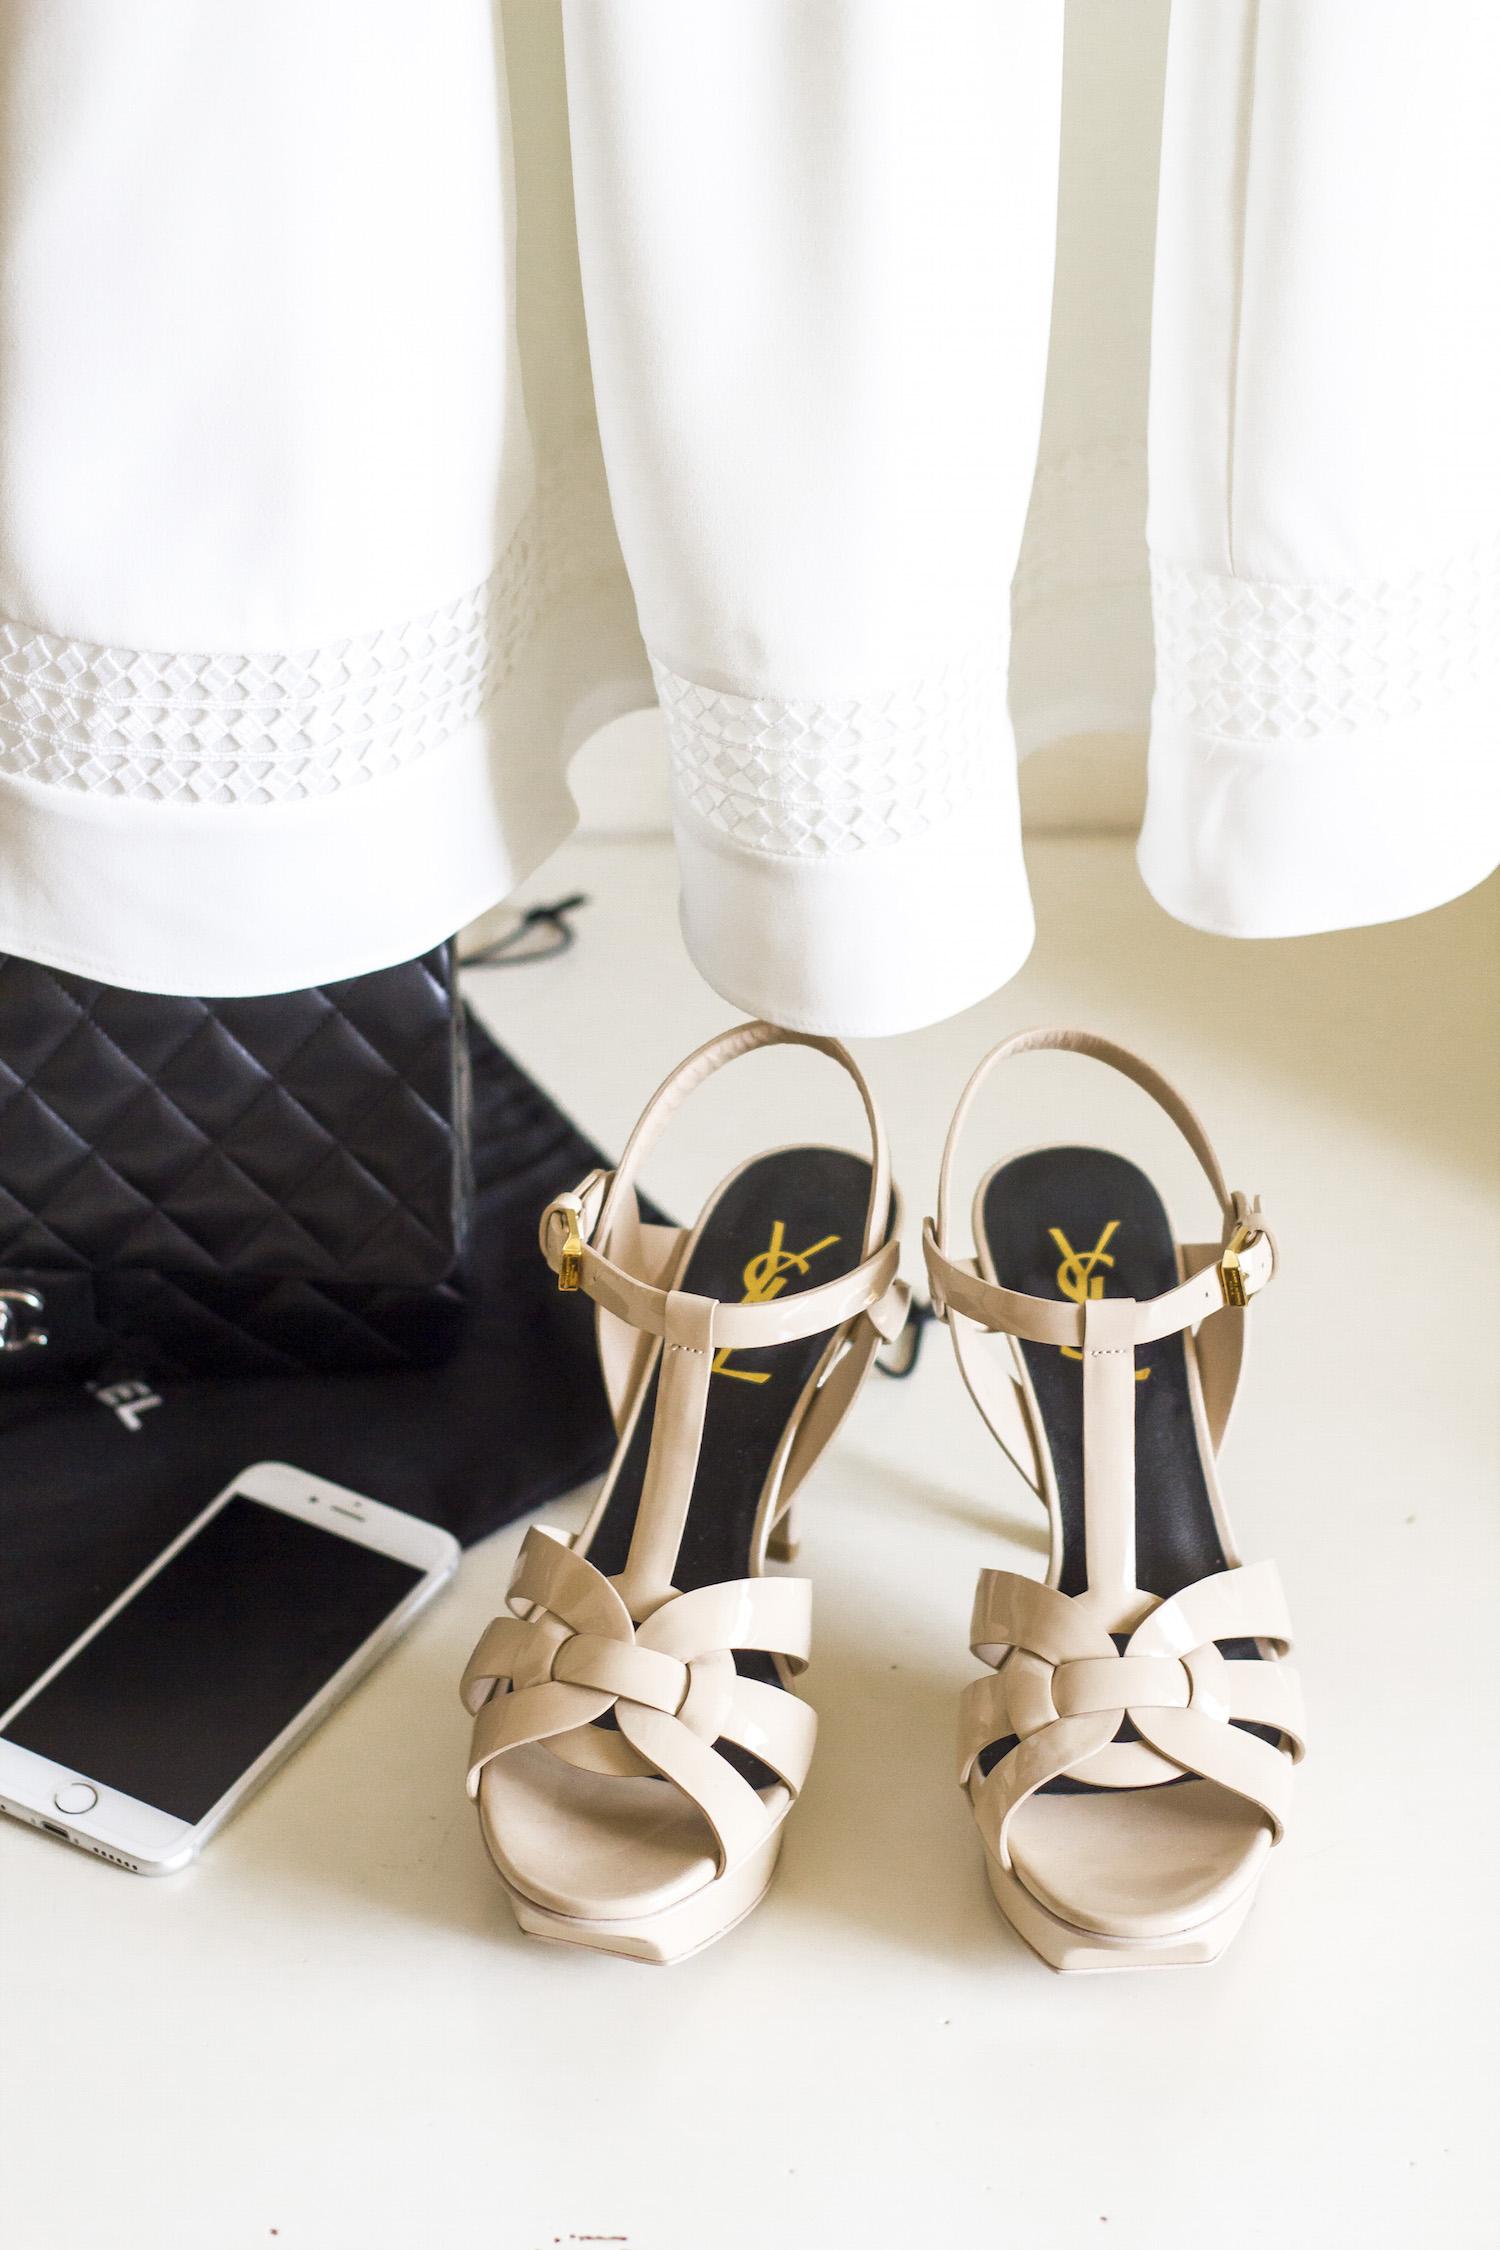 enn franco says fashion blog graduation outfit reiss dress chanel bag saint laurent sandals chopard ring tiffany key pendant